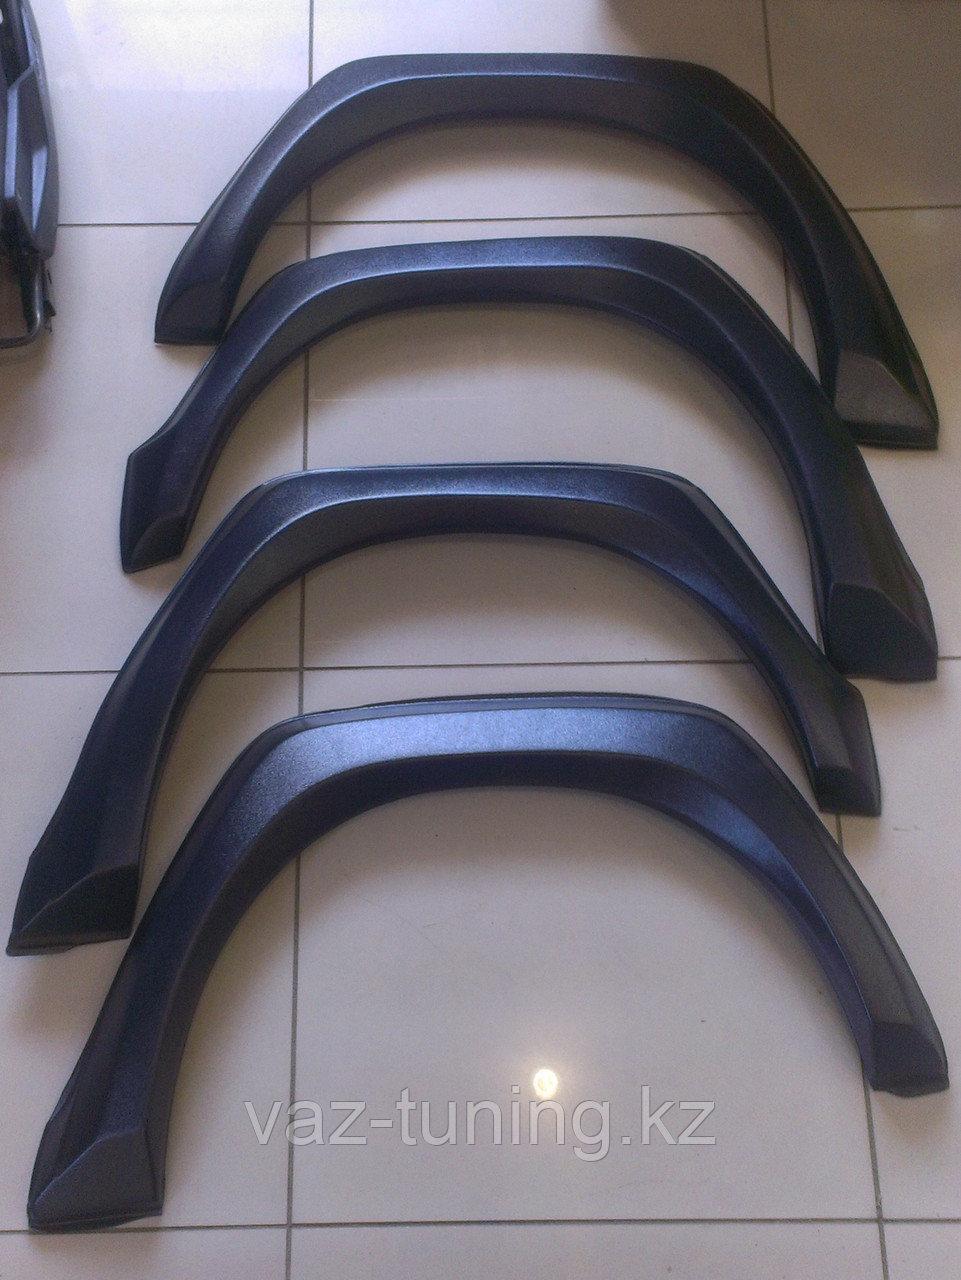 Накладки арок колес квадратные Лада Нива 2121